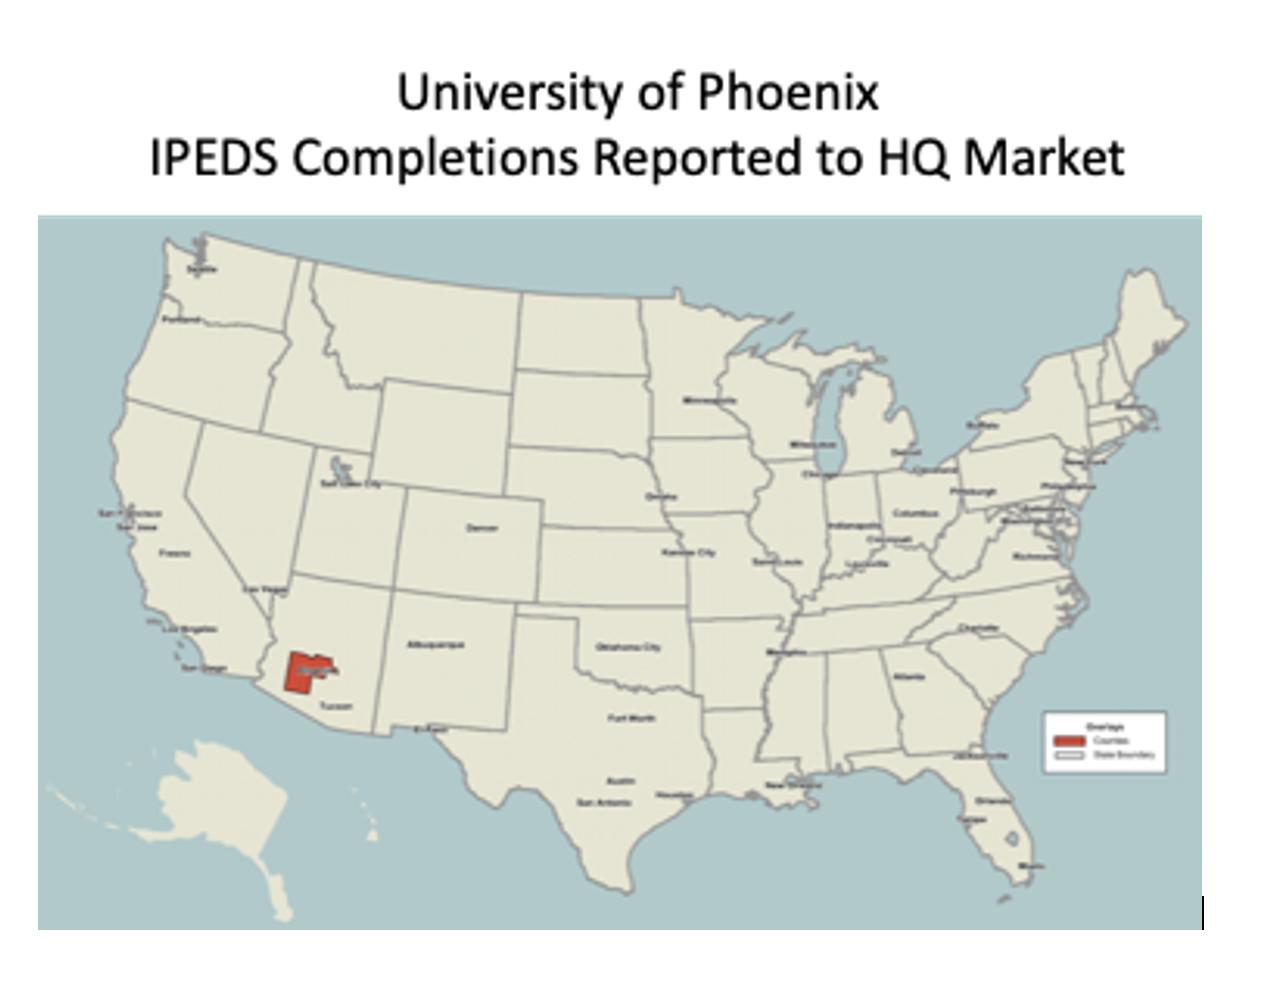 IPED Completions University of Phoenix